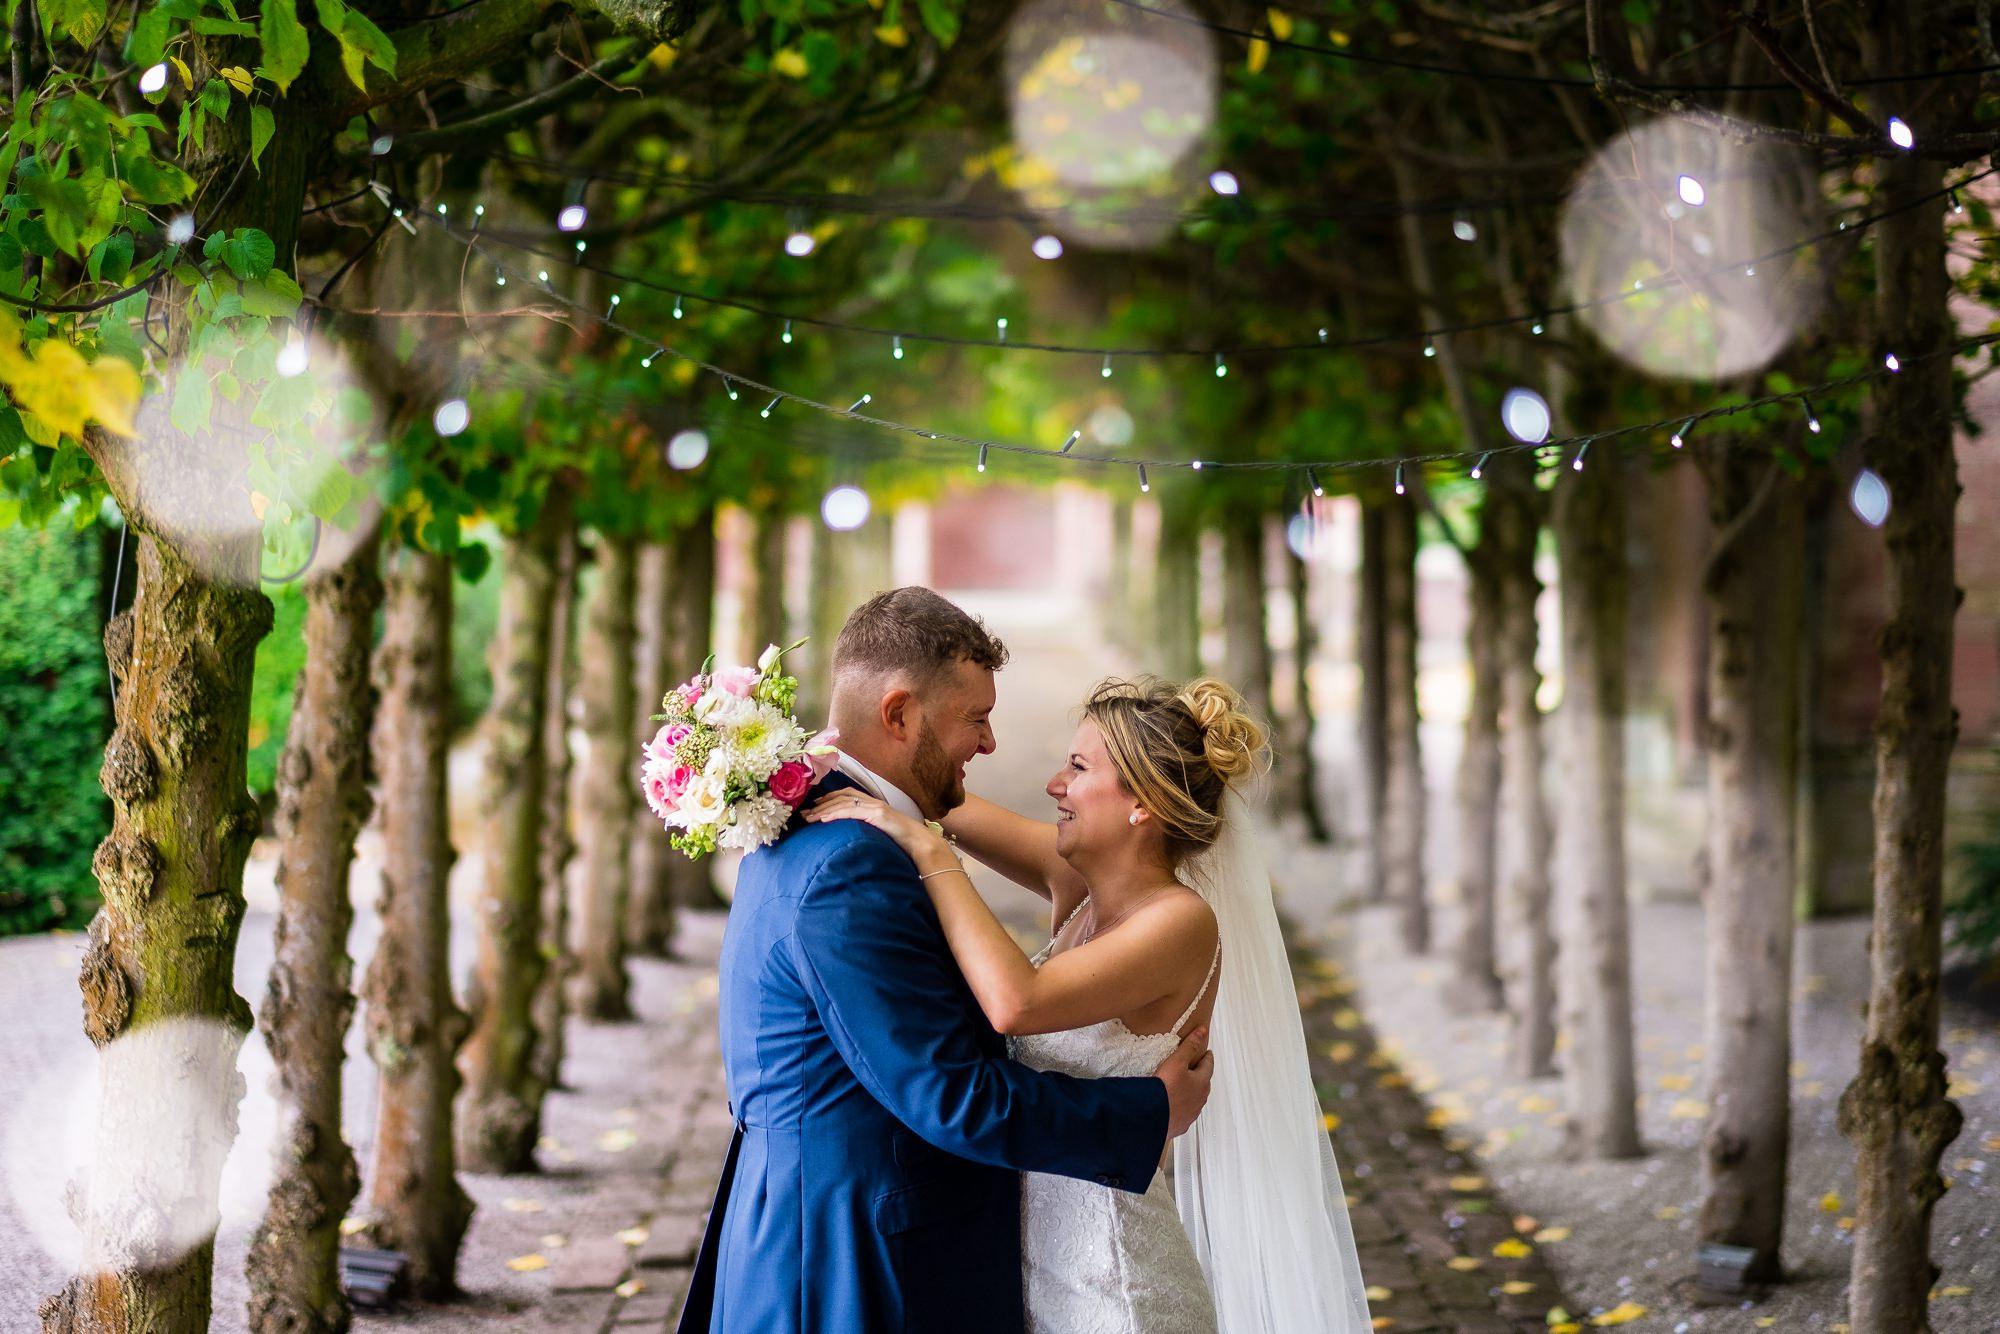 Best-Wedding-Photography-2018-Lancashire_0100.jpg